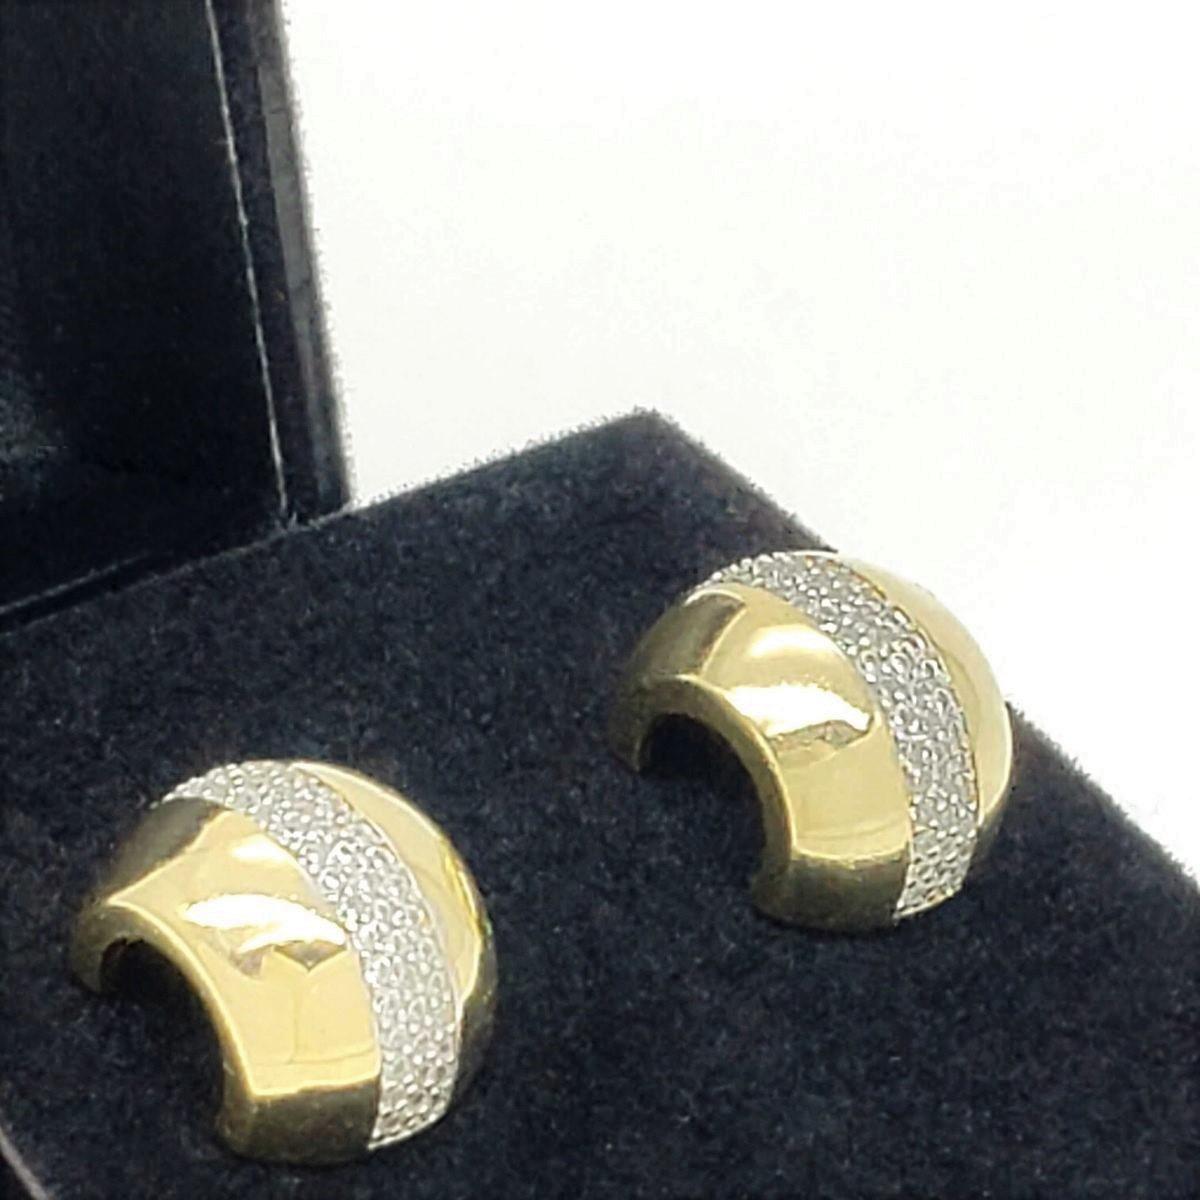 Brincos Argola Cravejados De Zirconias Banho De Ouro 18k 2588